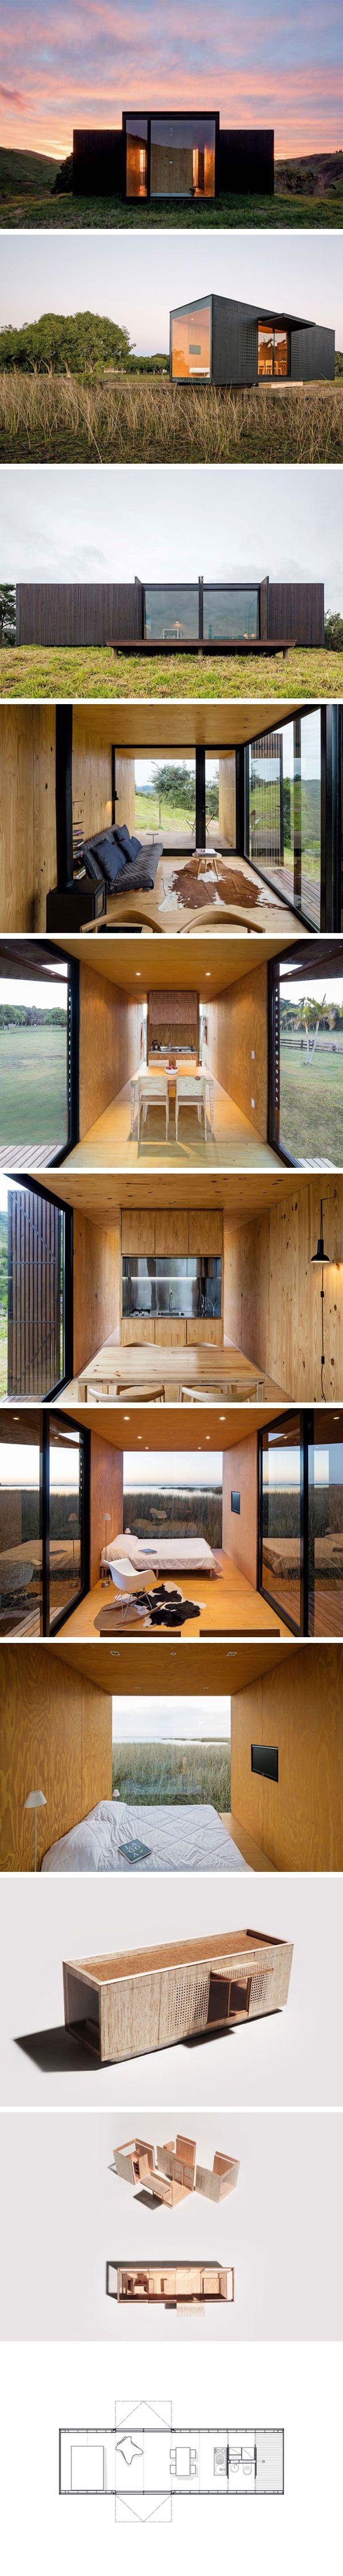 Модульный дом Minimod от MAPA Architects  #tinyhomesdigest #tinyhouse #smallhouse #ecohouse #countrylife #backyard